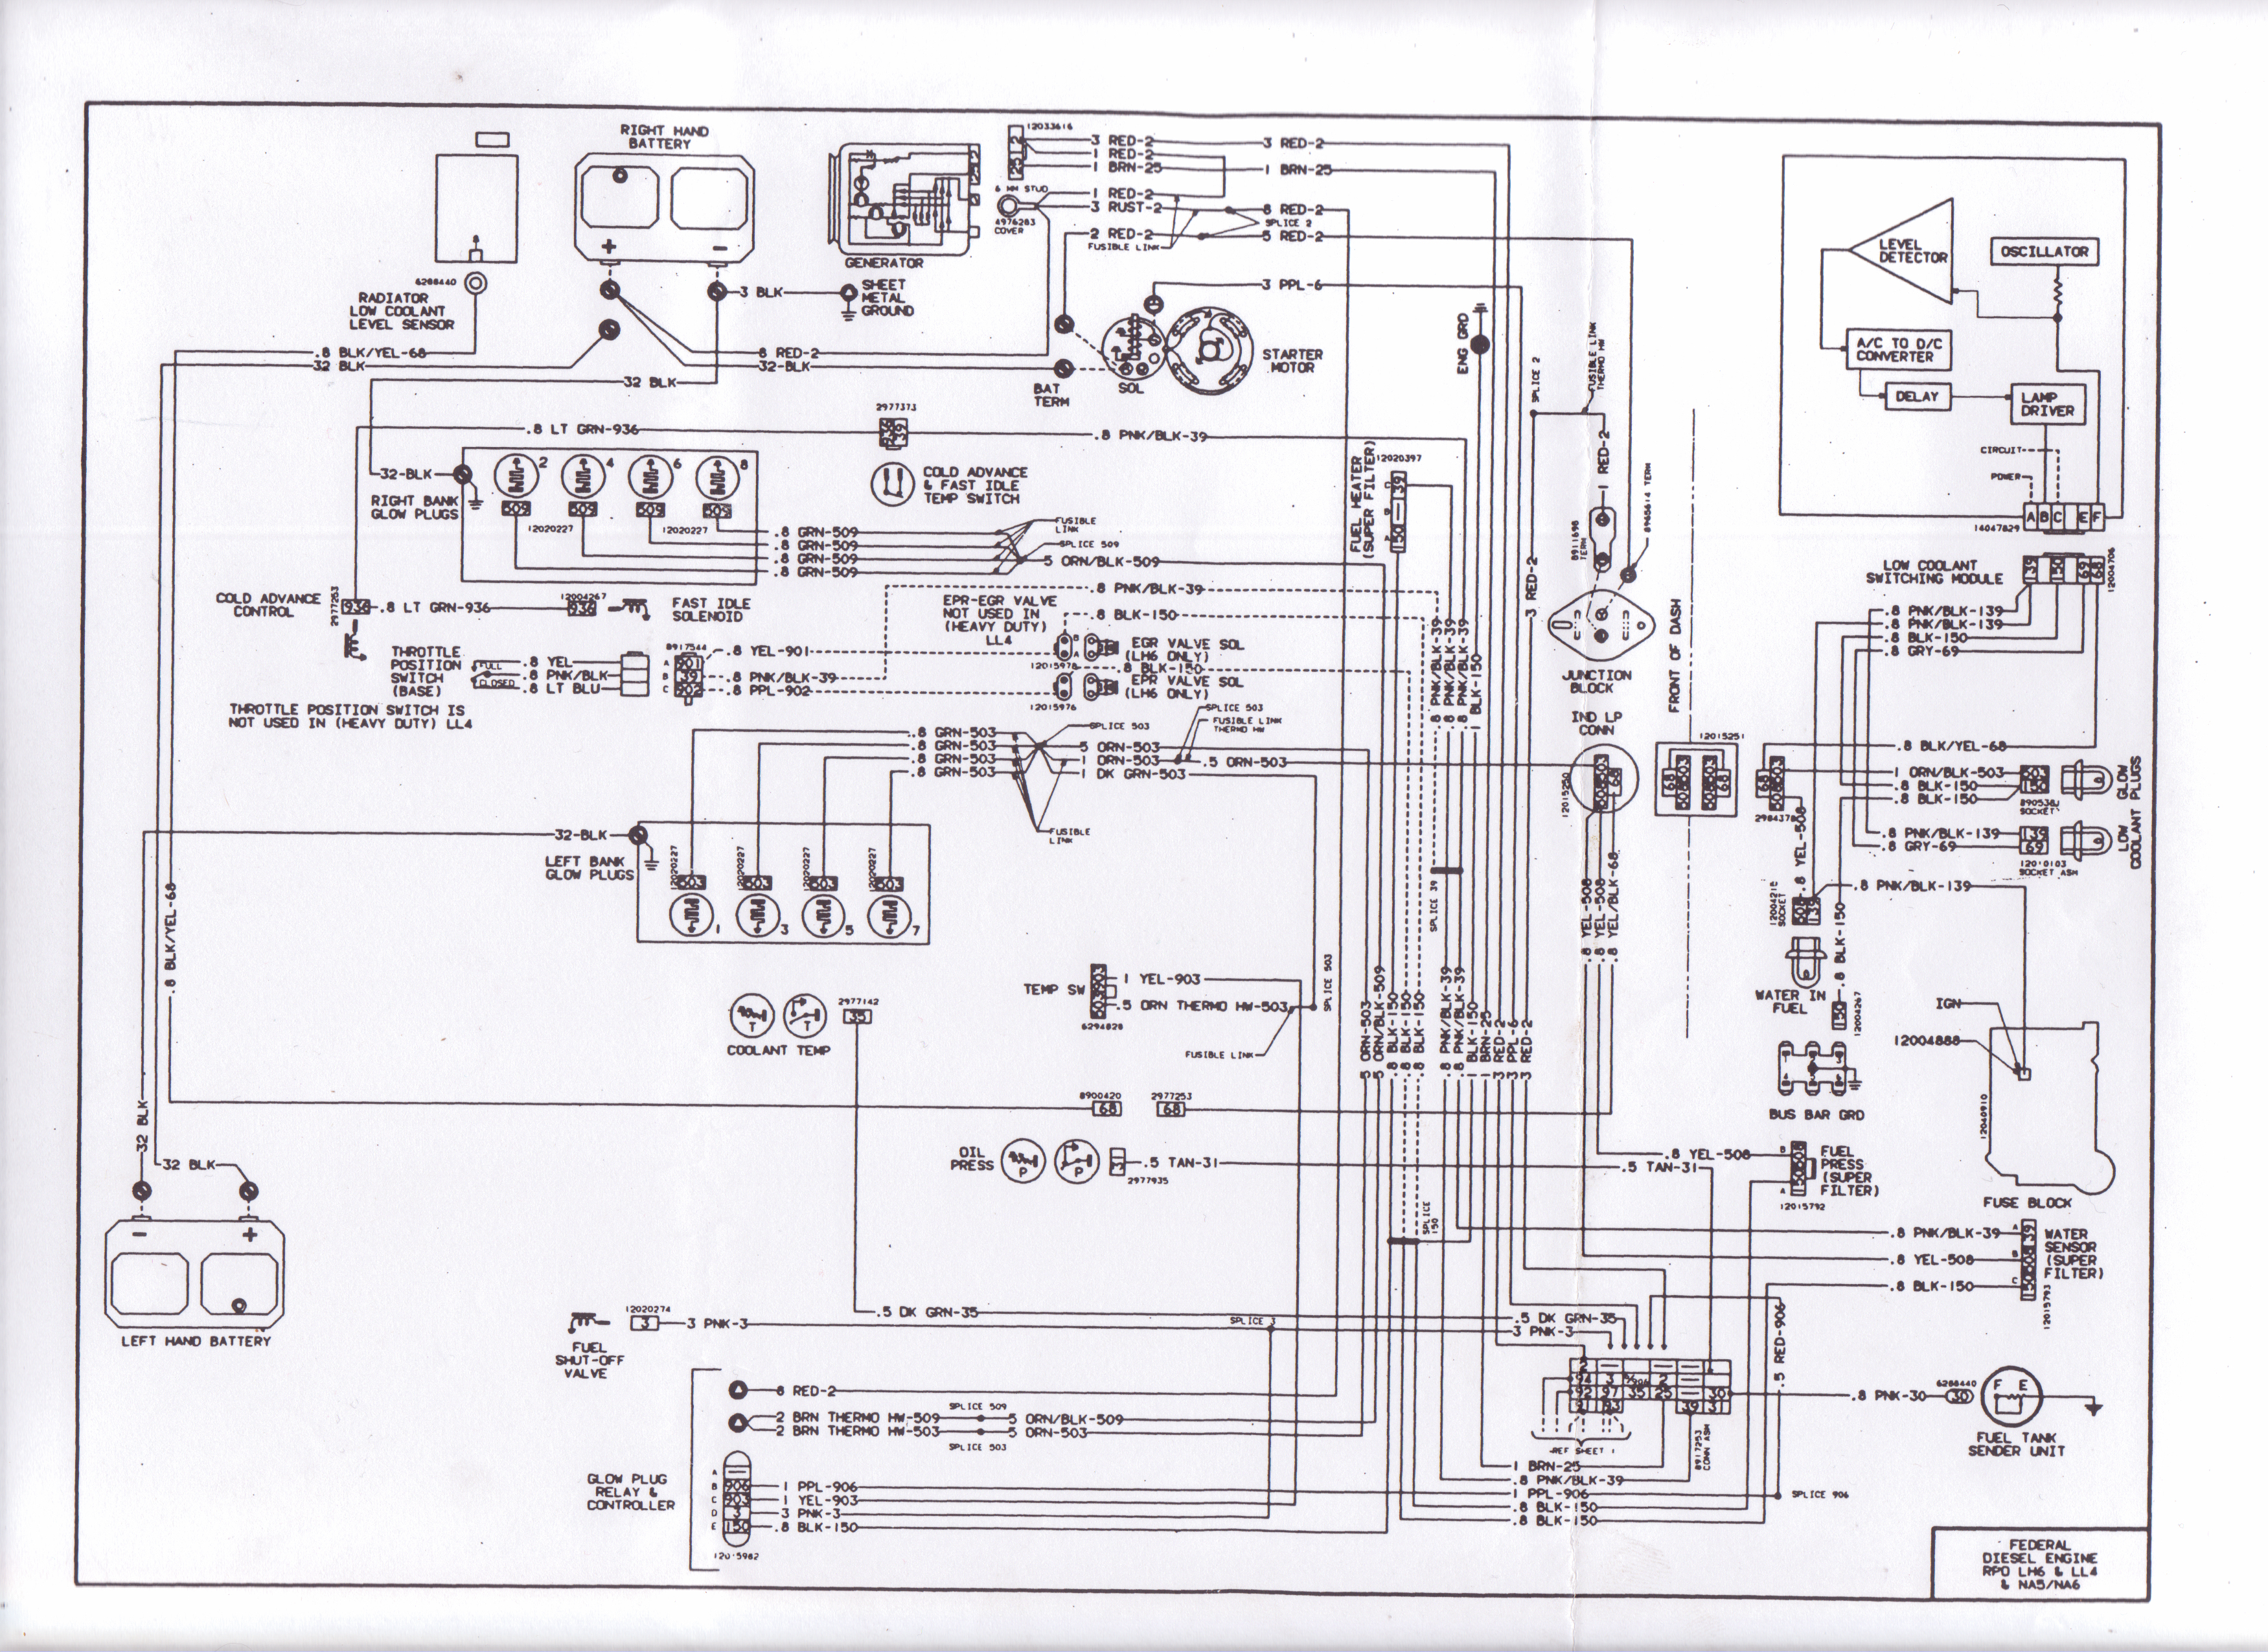 Outstanding K1500 Trailer Wiring Diagram Wiring Library Wiring Cloud Licukaidewilluminateatxorg